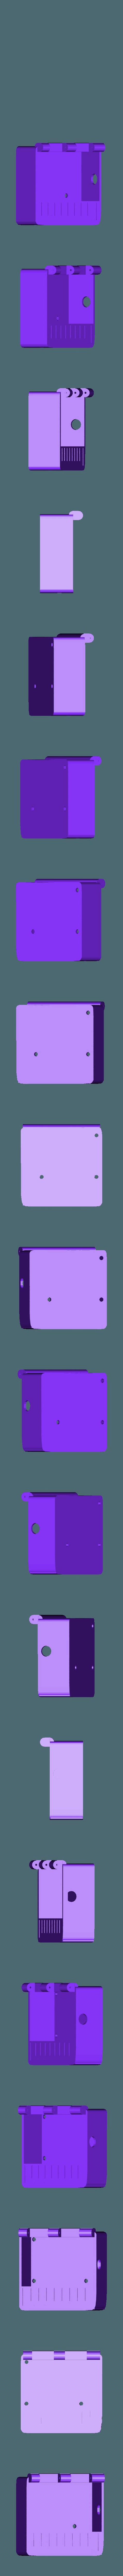 caja_inferior_reciente.stl Download STL file Piano Hole Punch Music Box • 3D printable model, drk0027